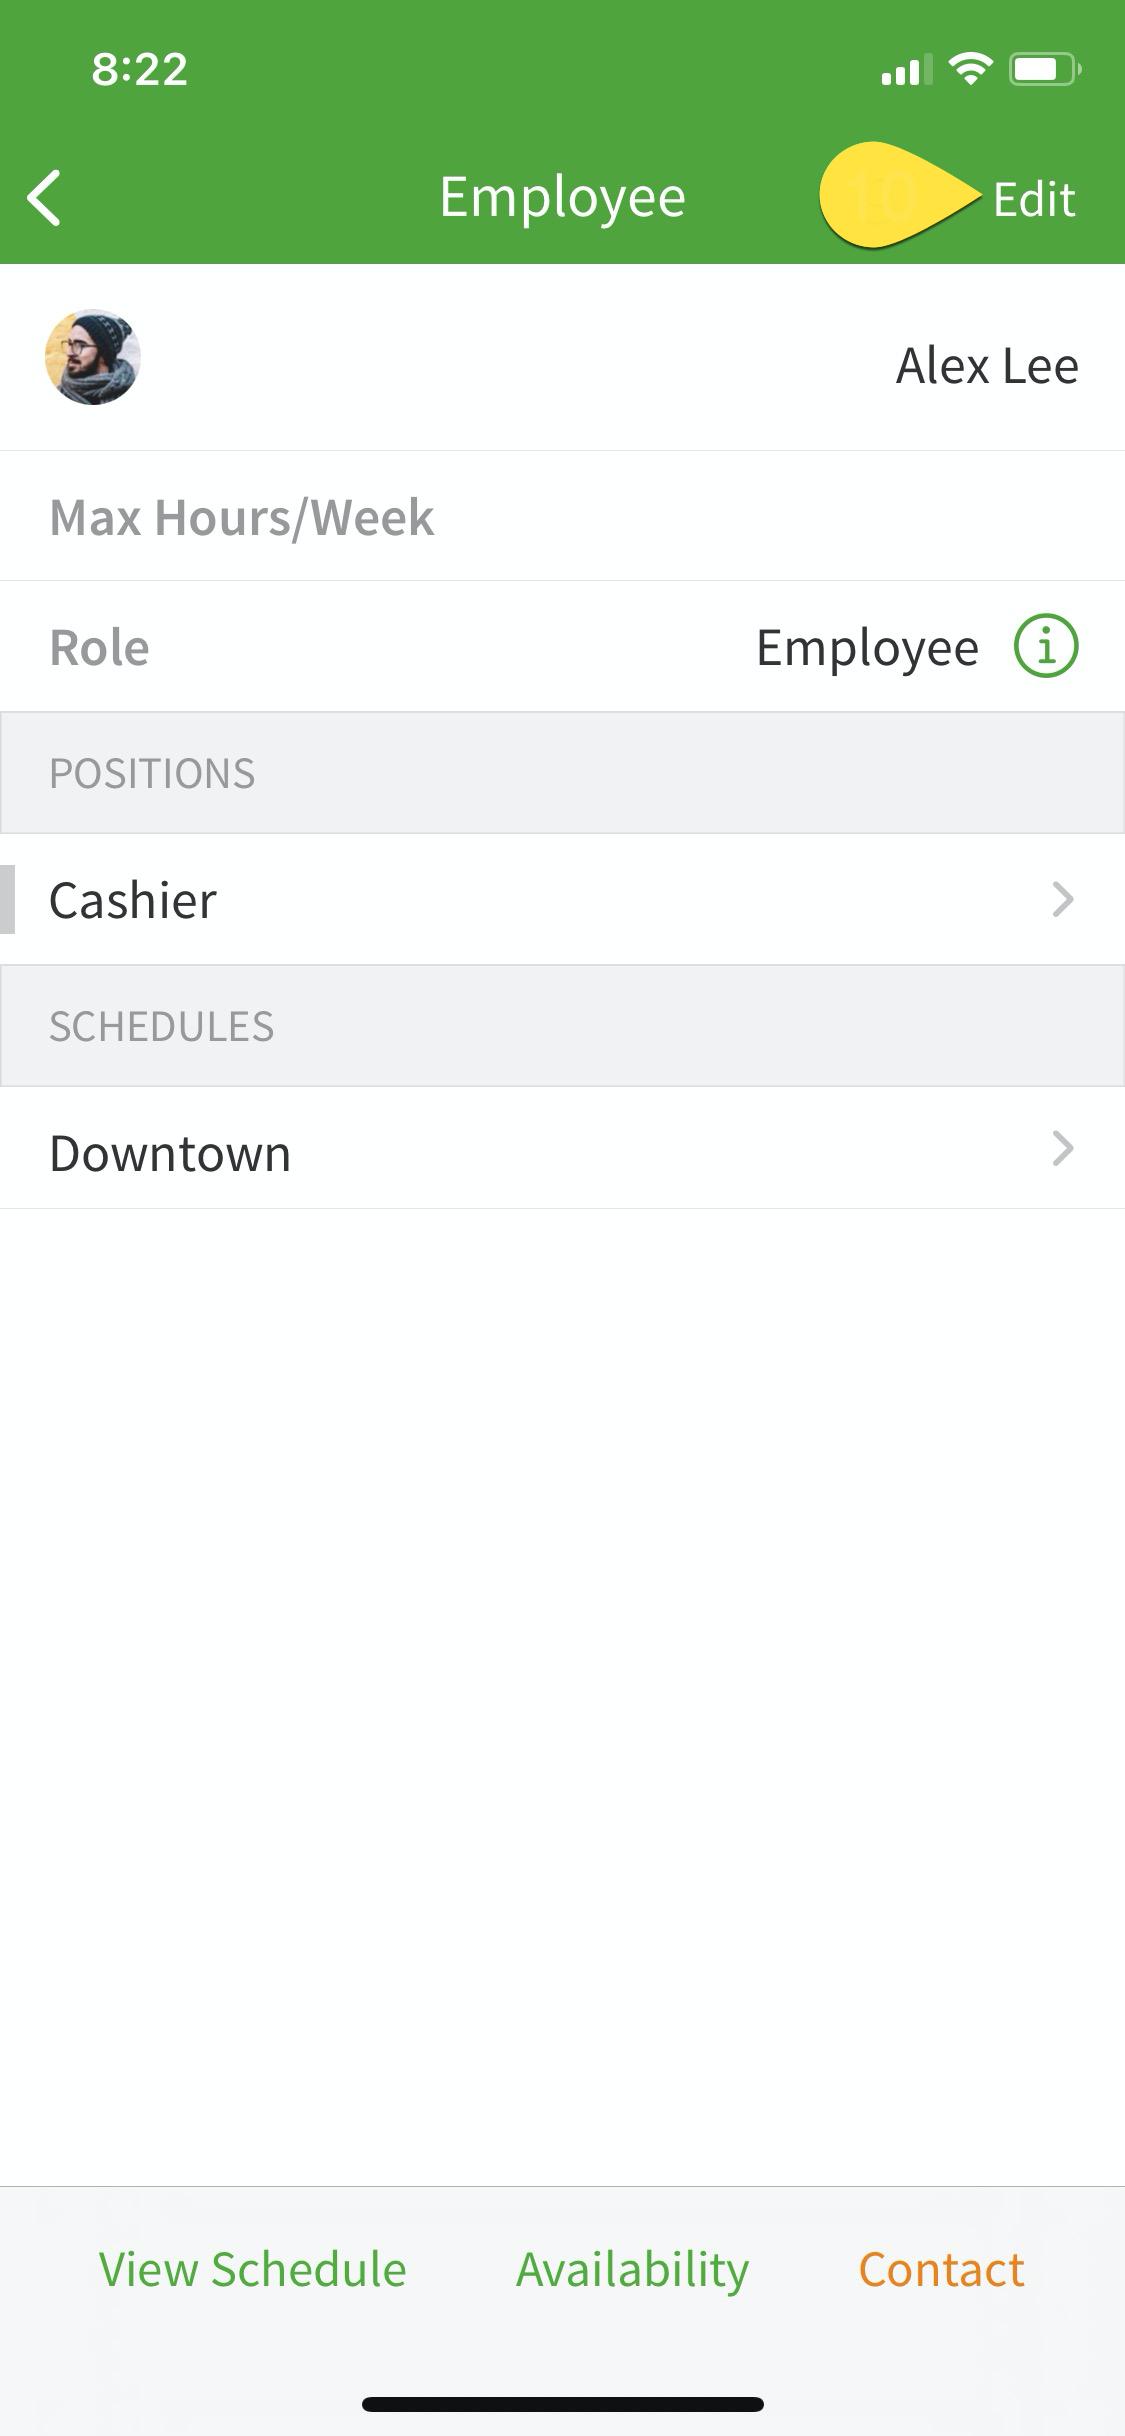 Employee profile edit option